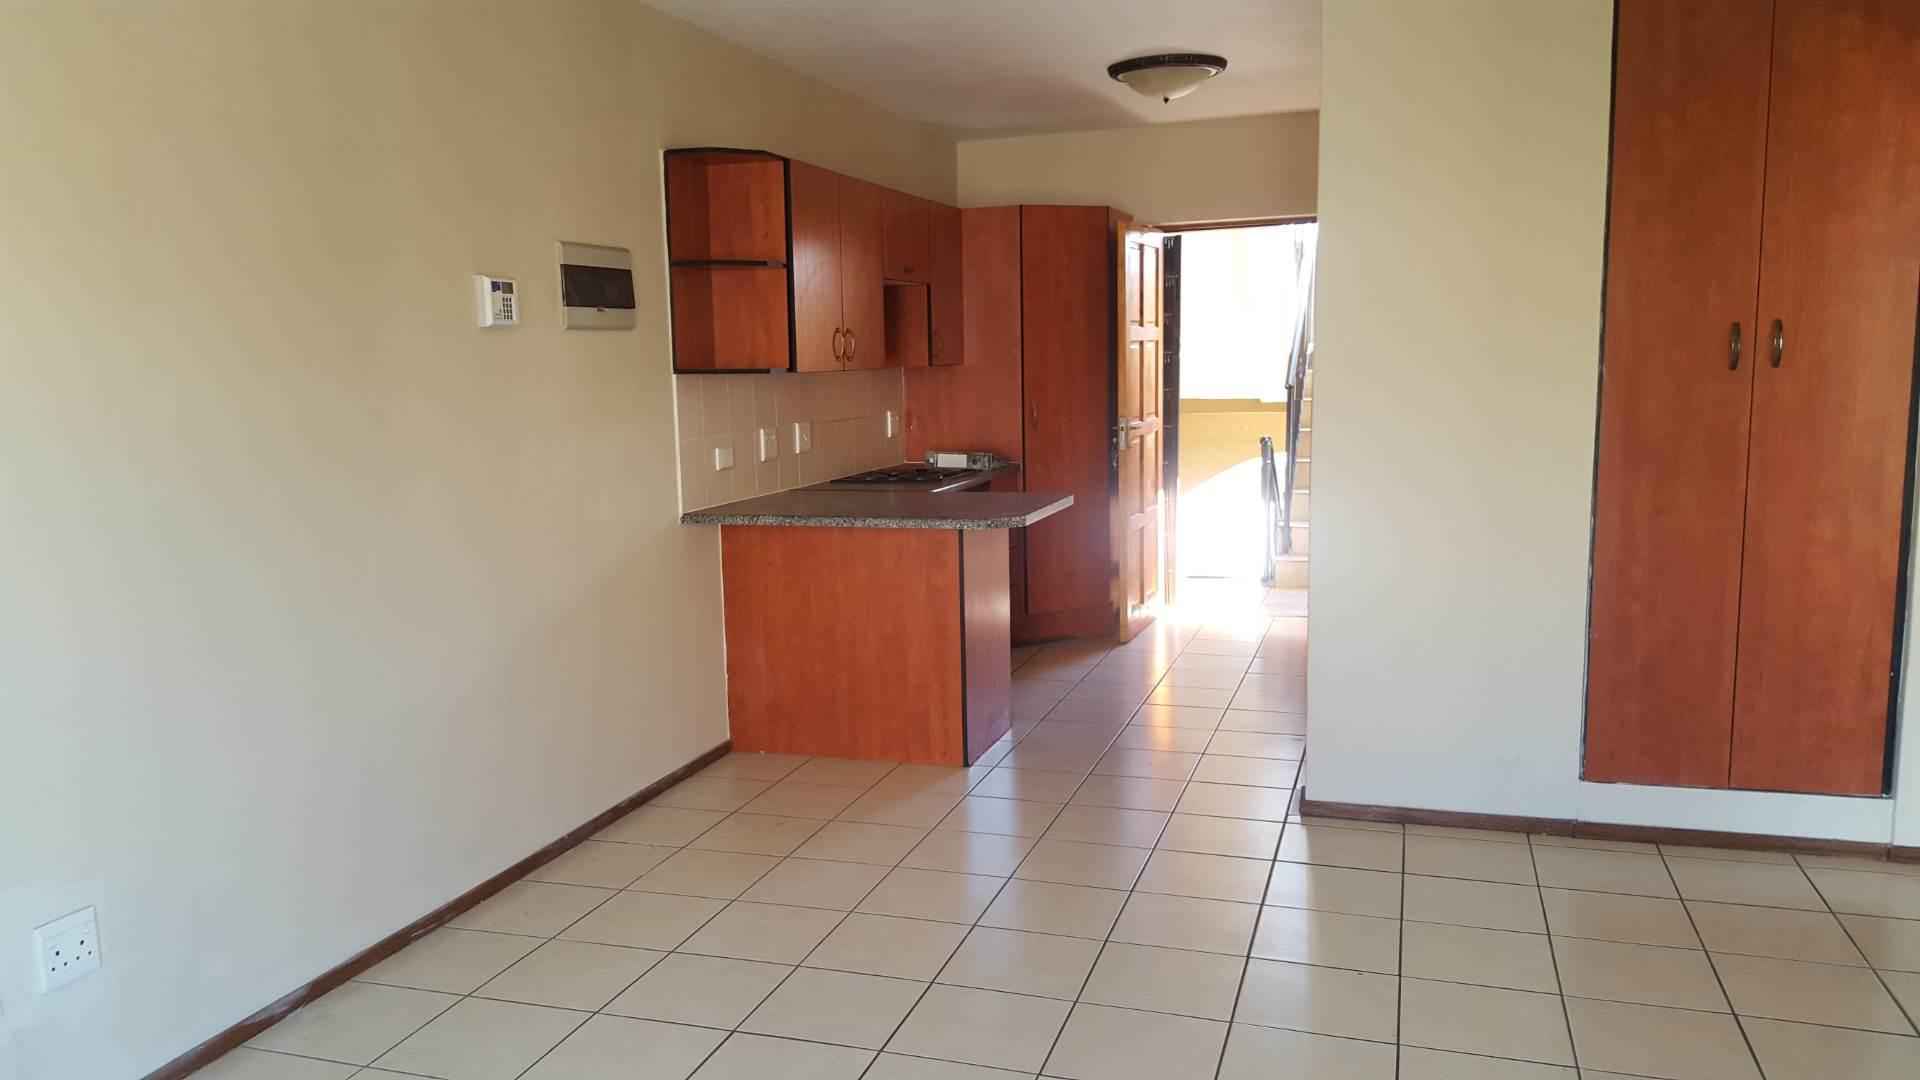 2 BedroomFlat To Rent In Reyno Ridge